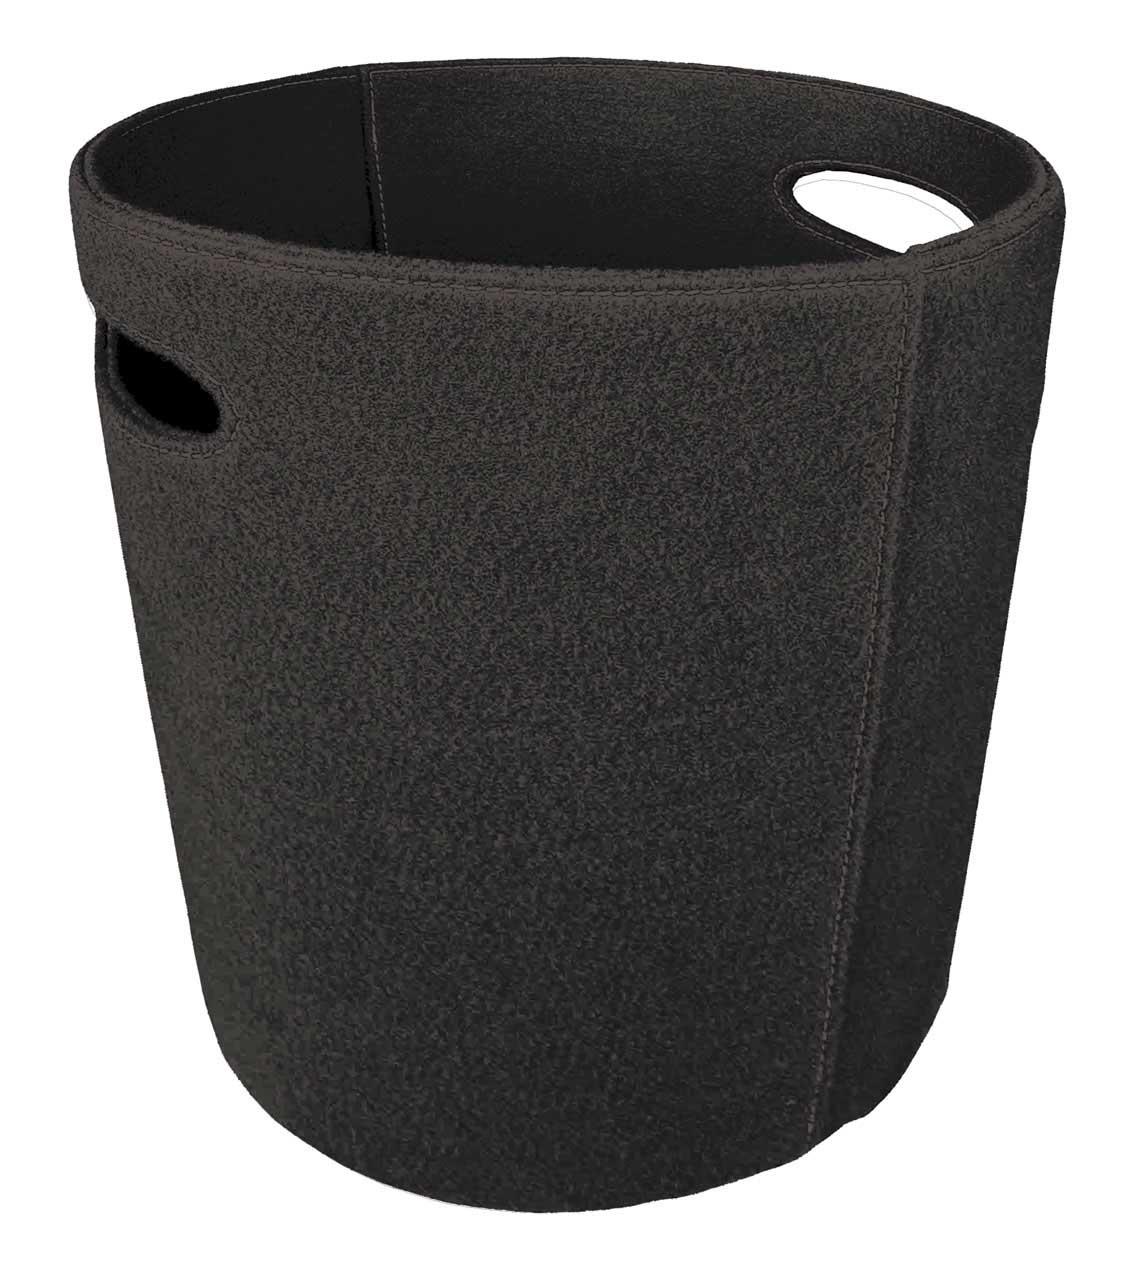 holzkorb kaminholzkorb lienbacher filzkorb schwarz 48x27x45cm bei. Black Bedroom Furniture Sets. Home Design Ideas